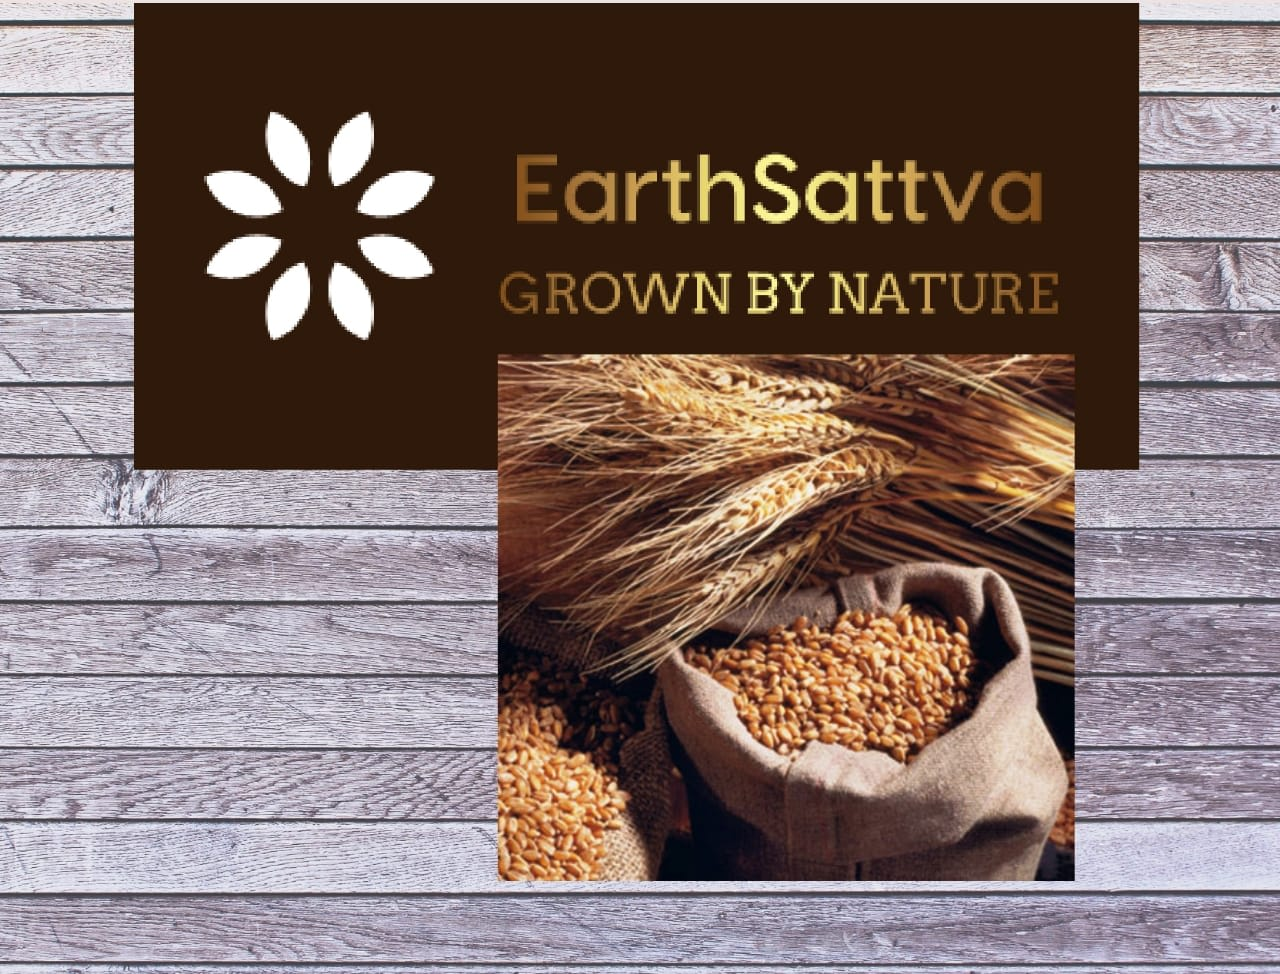 Earth Sattva